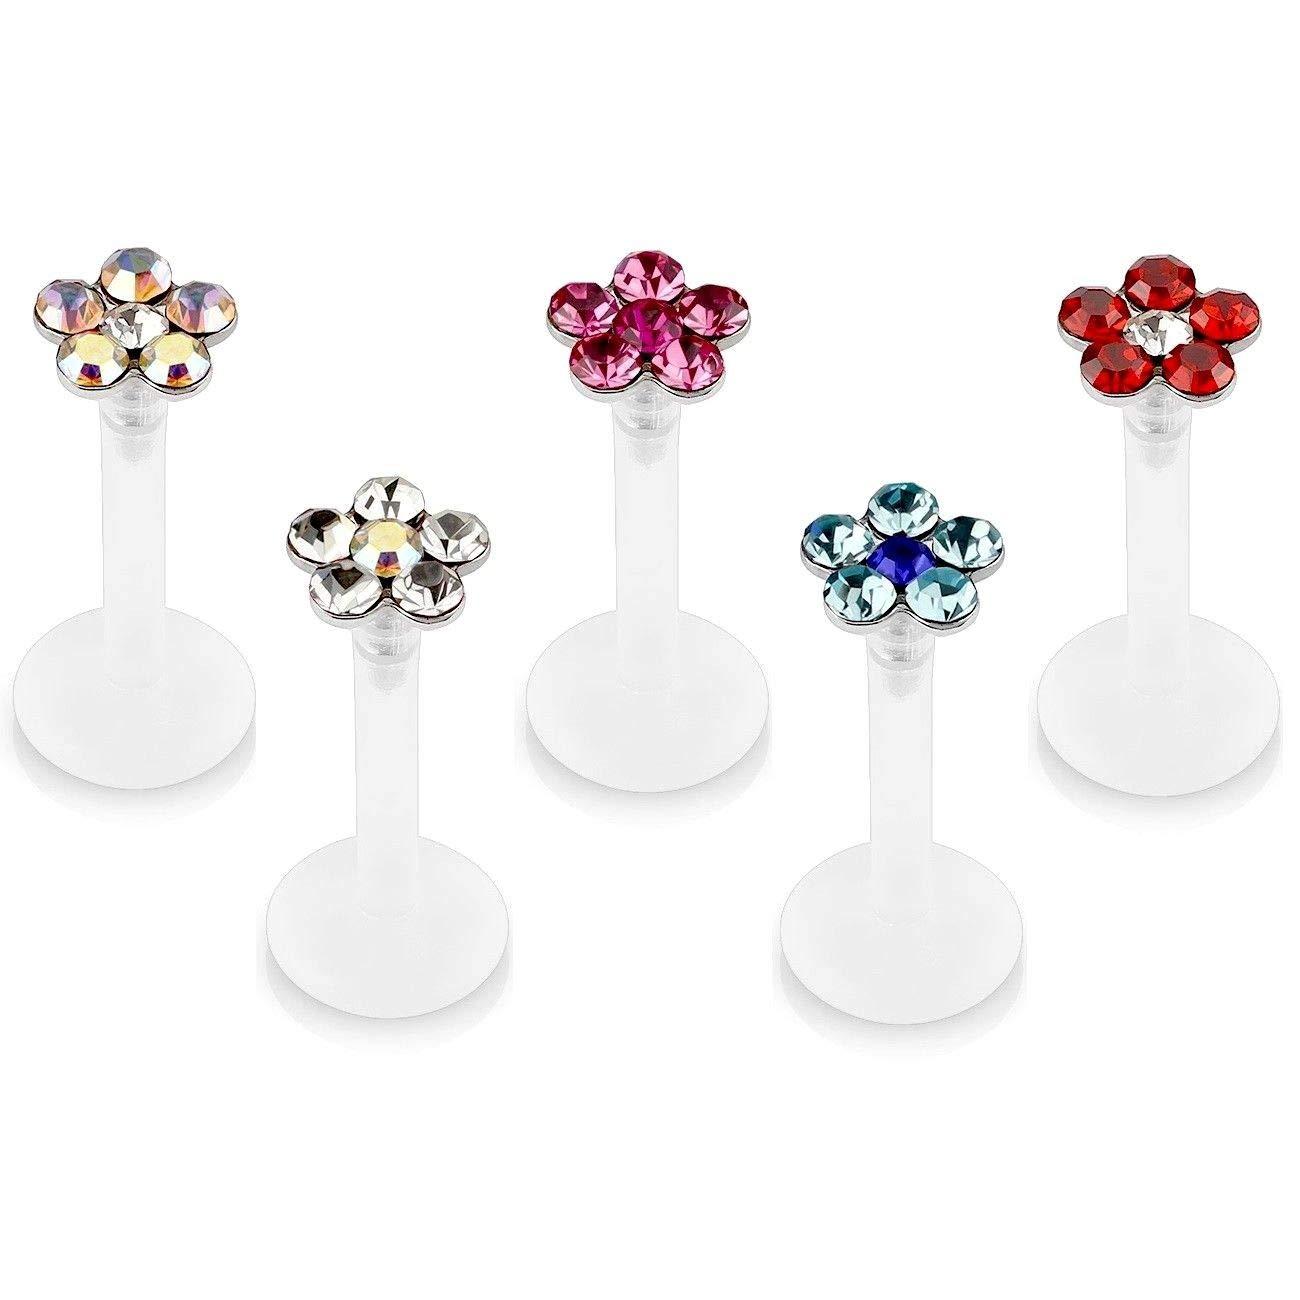 Size 5//16 adt/_pi 5 Pcs Multicolor Gemmed Flower Flexible Labret Monroe Rings Studs Lip Chin Ear Cartilage Jewelry 8mm